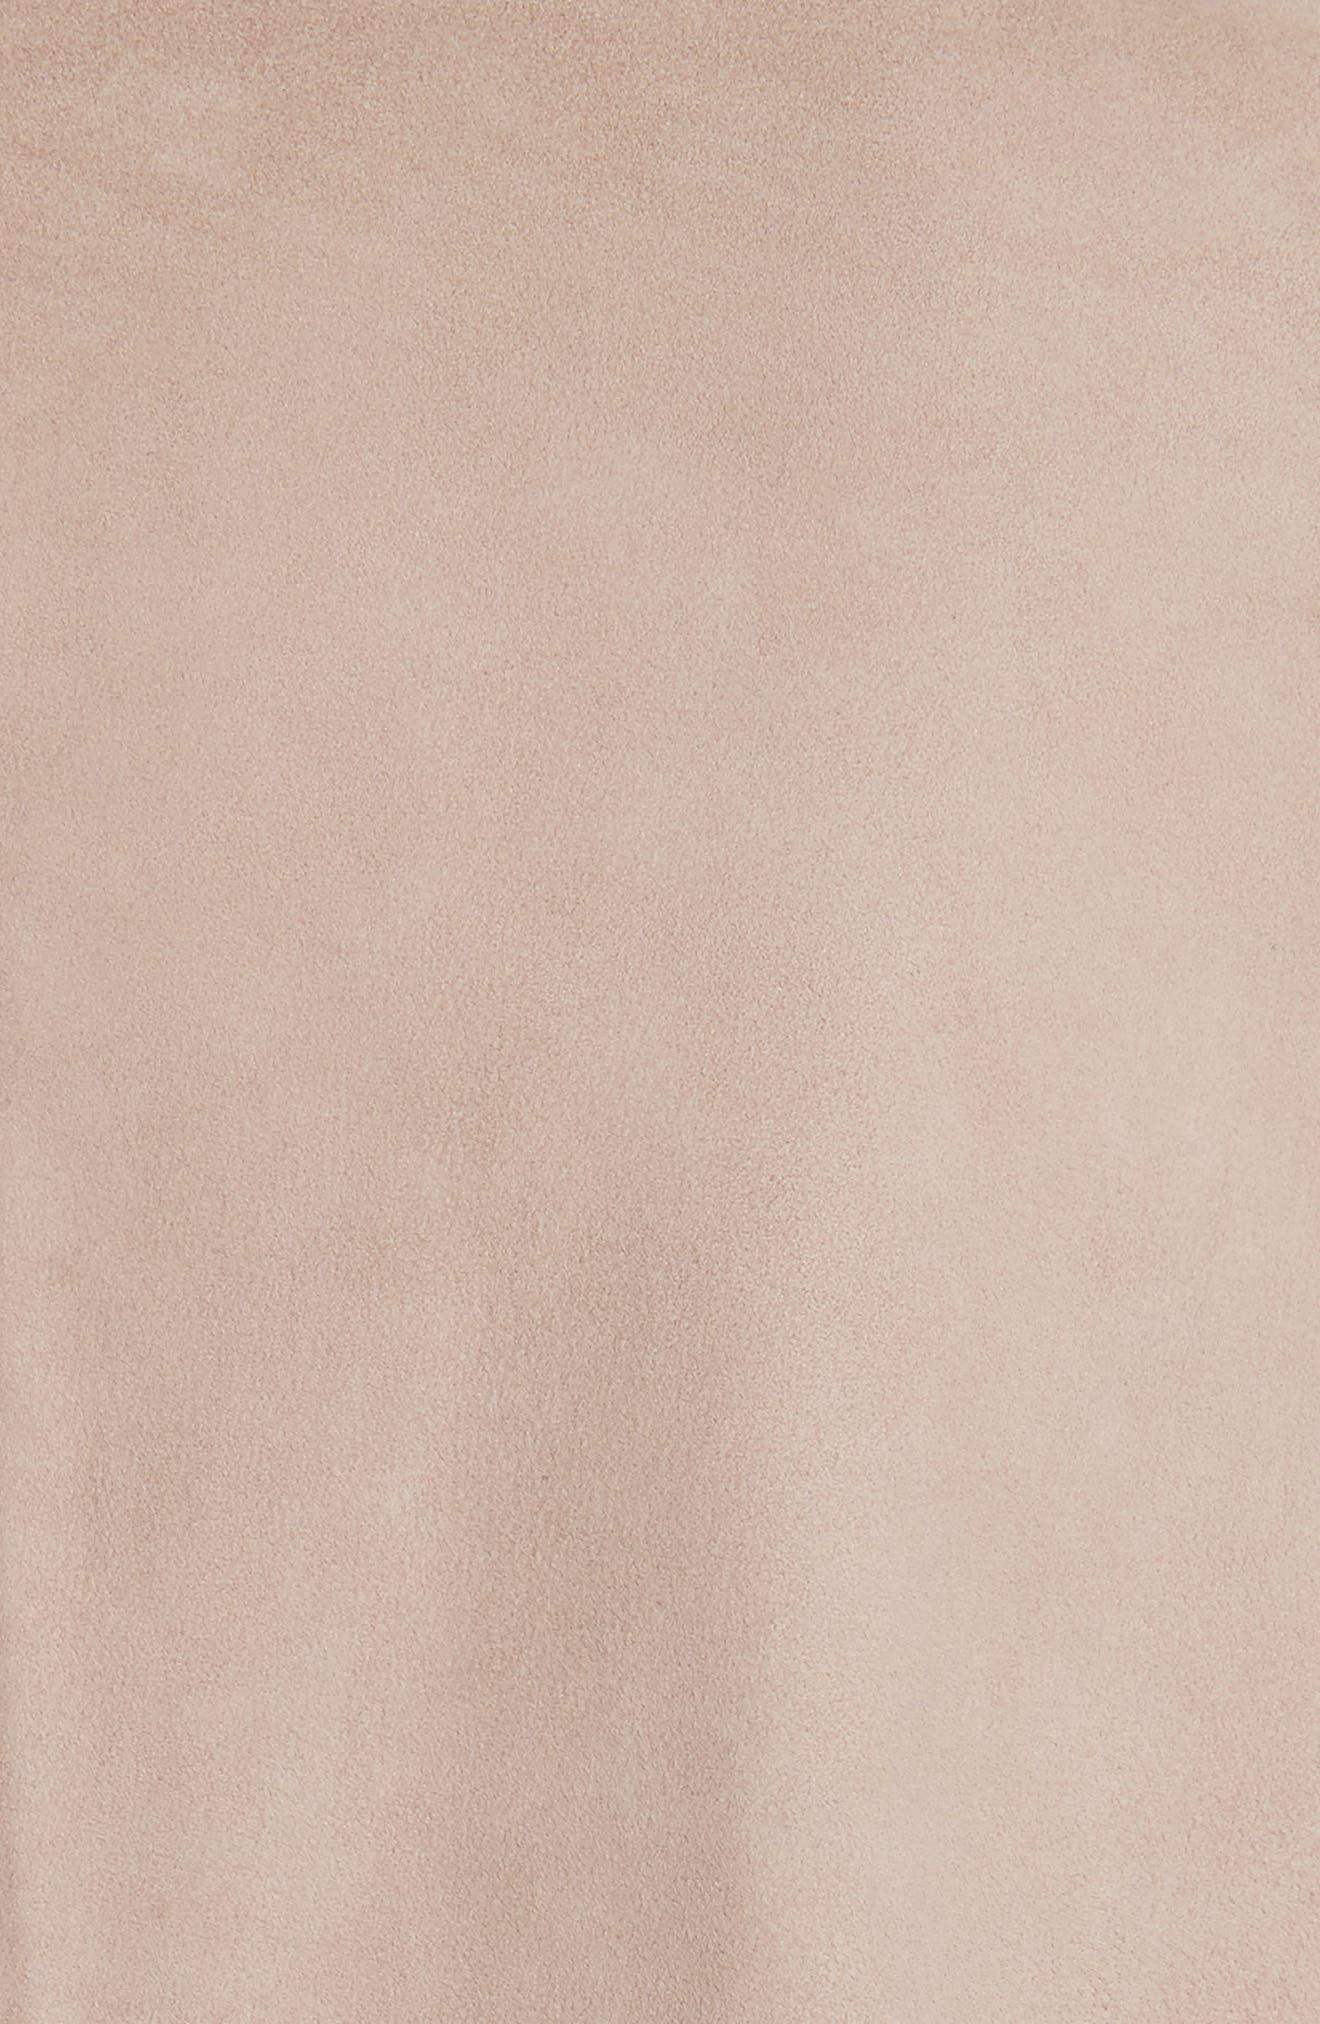 Laritza Braided Leather Vest,                             Alternate thumbnail 5, color,                             Osprey